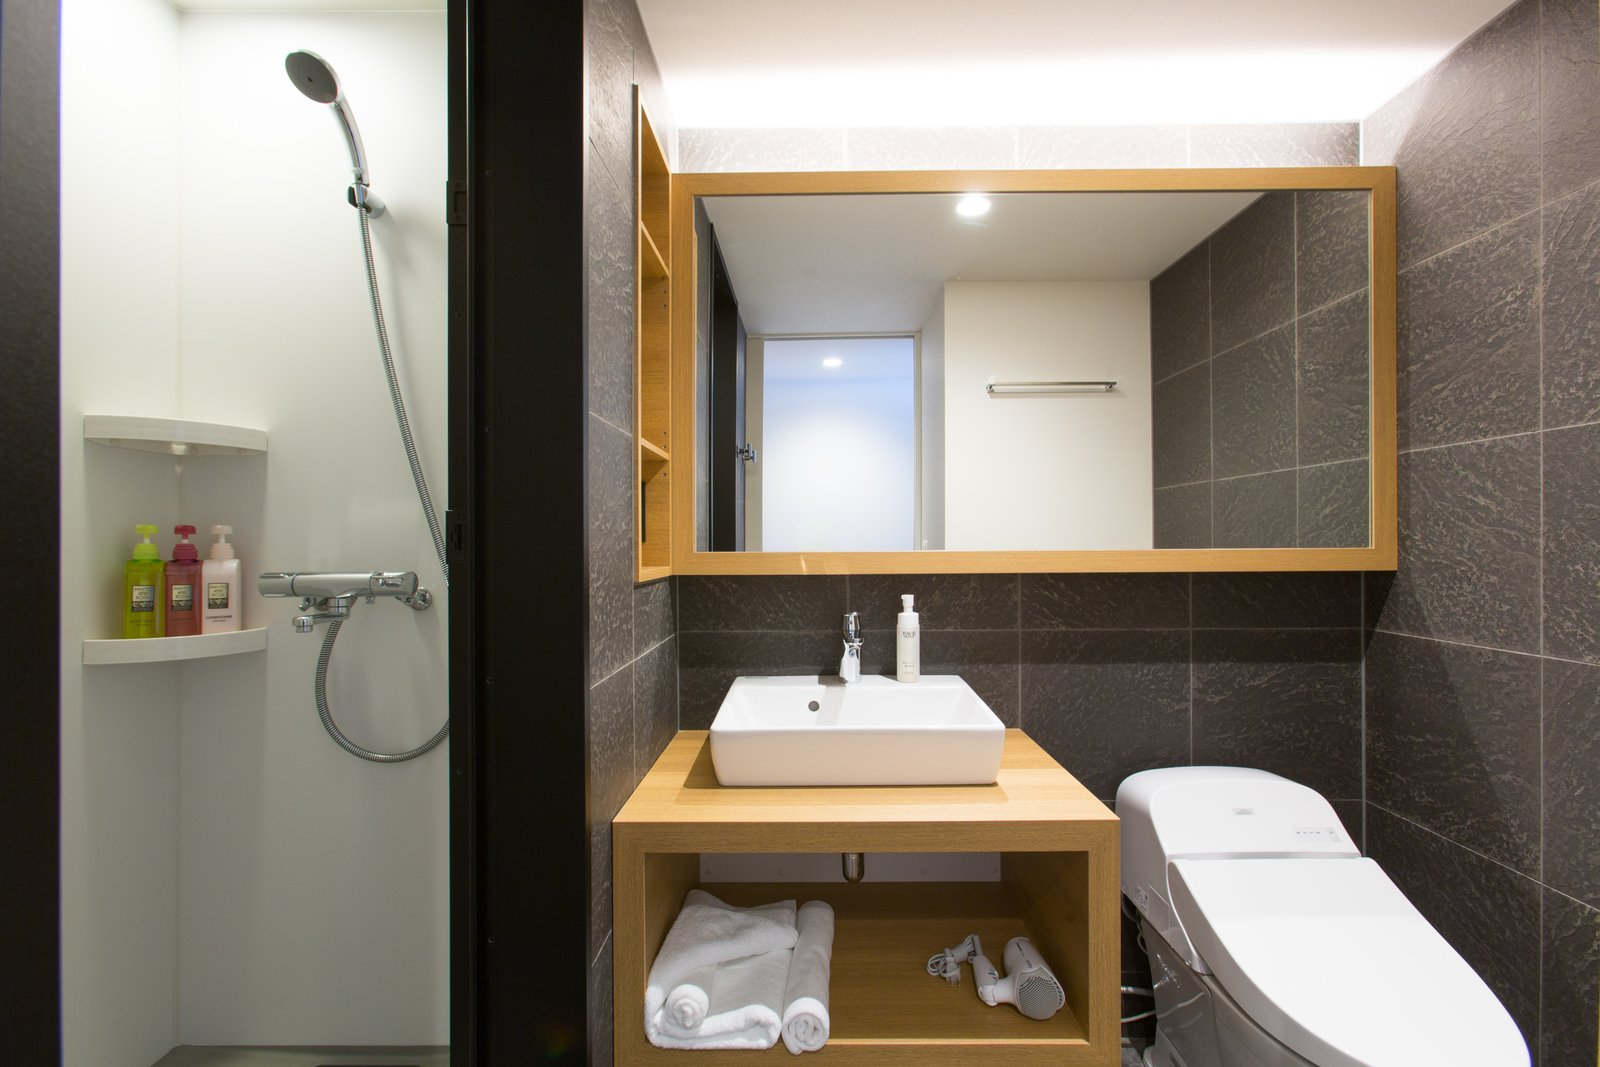 Hirafu yuuki and yotei fuu bathroom large